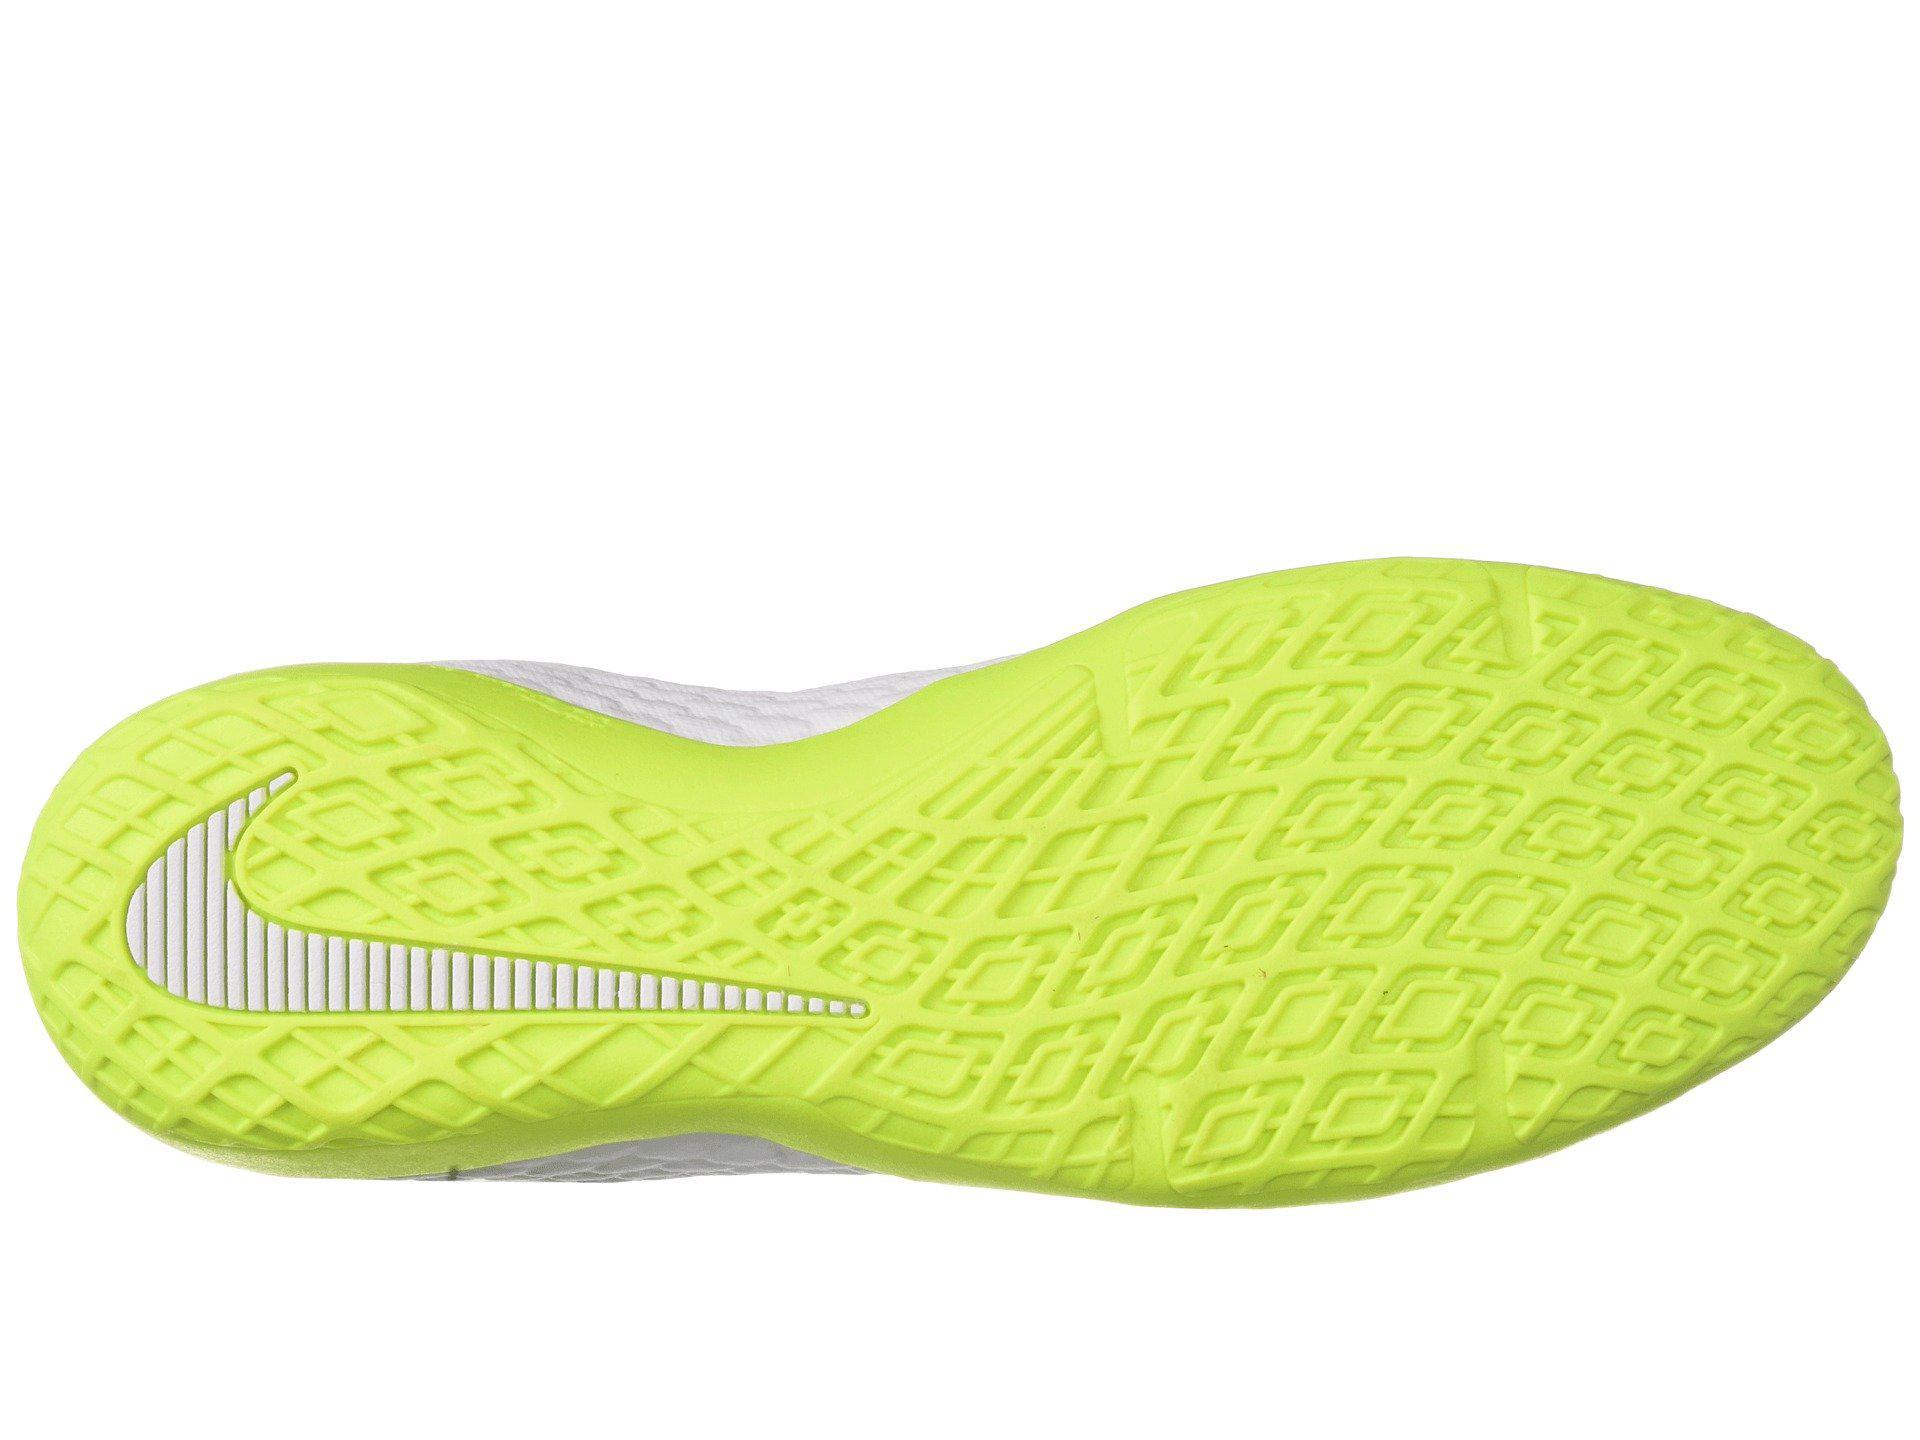 ffe171d646 Lyst - Nike Hypervenom Phantomx 3 Academy Dynamic Fit Ic in White ...